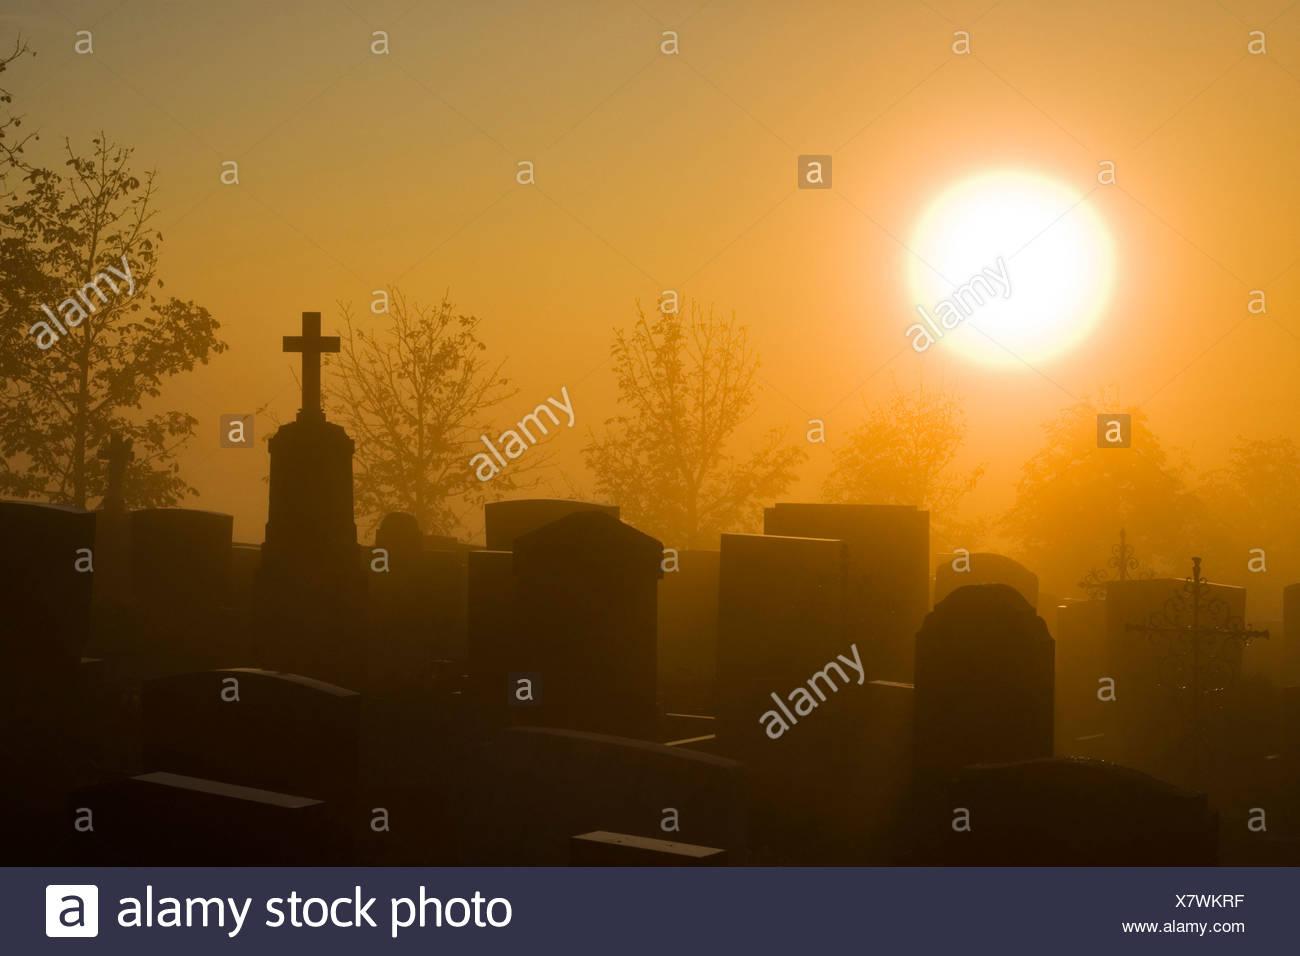 Germany, Bavaria,, Hohenpeißenberg Grave yard at dawn Photo Stock